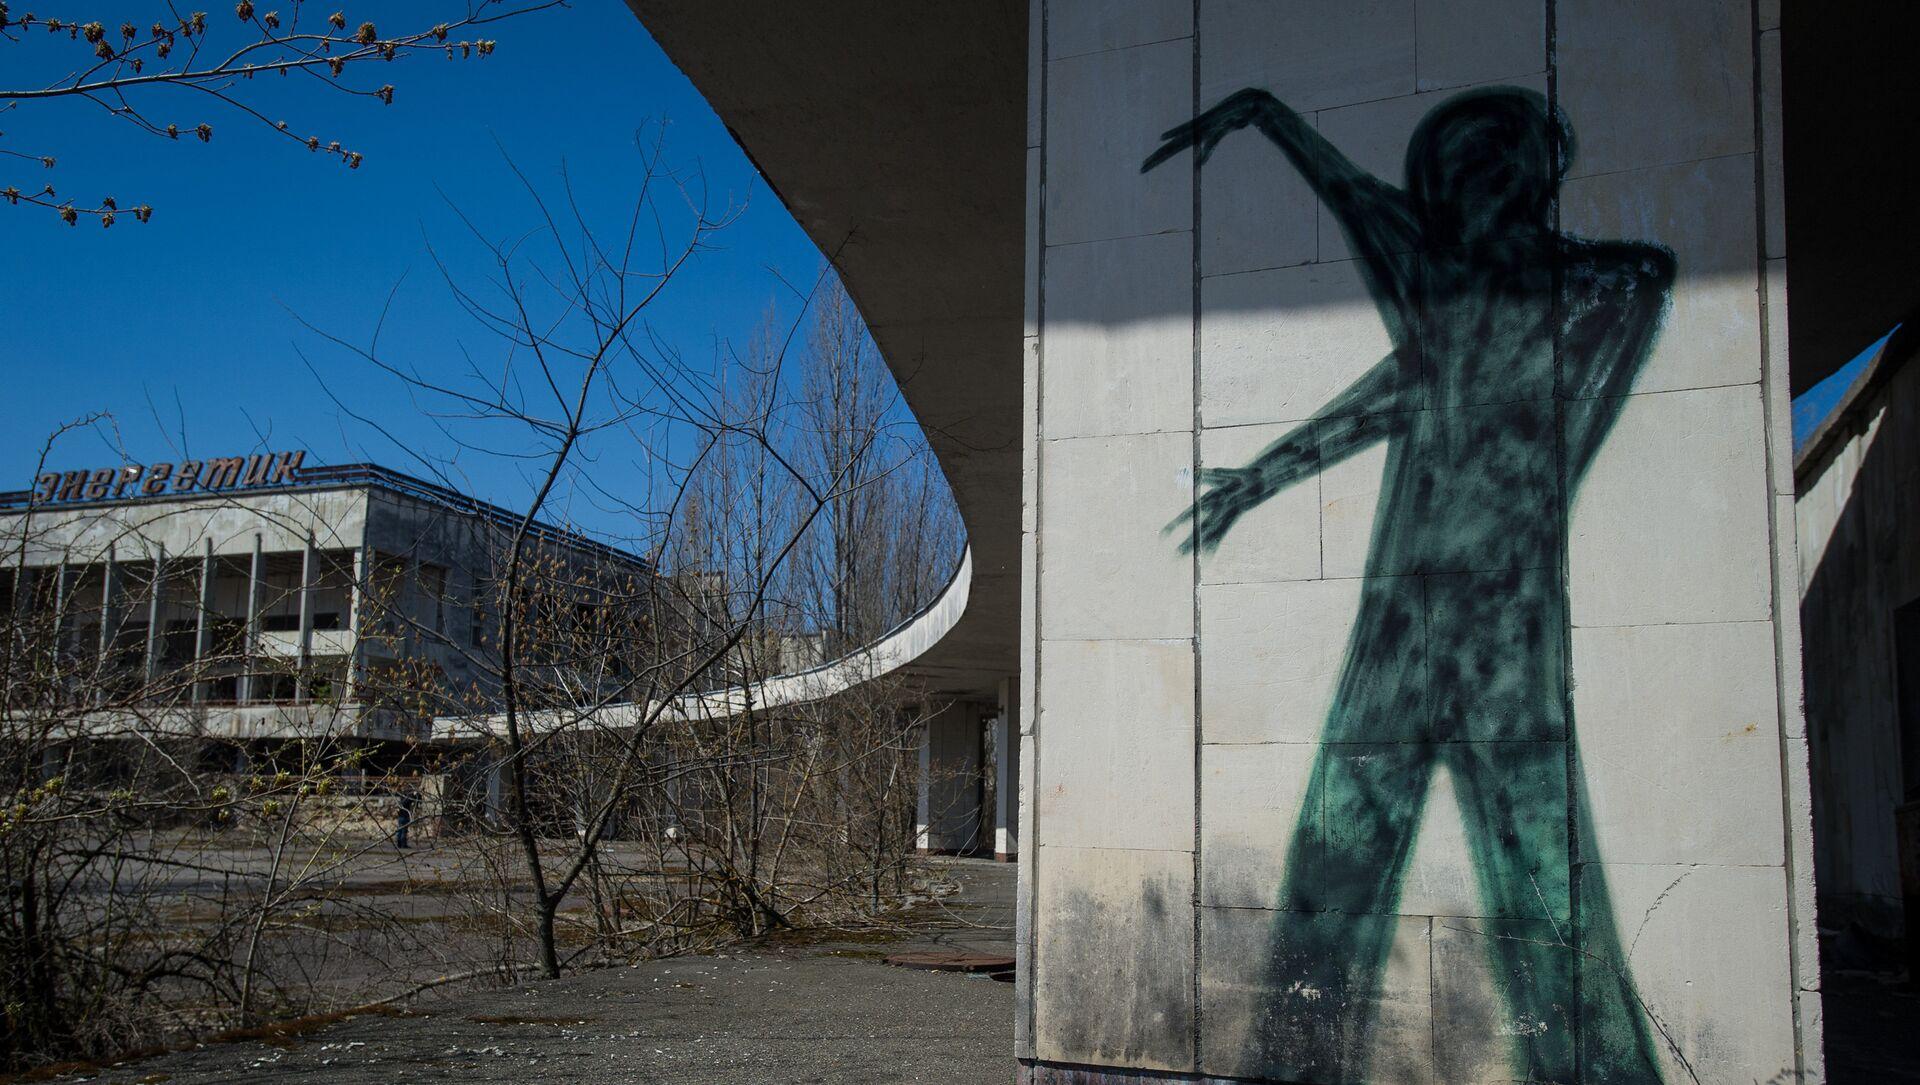 Czarnobyl - Sputnik Polska, 1920, 26.04.2021